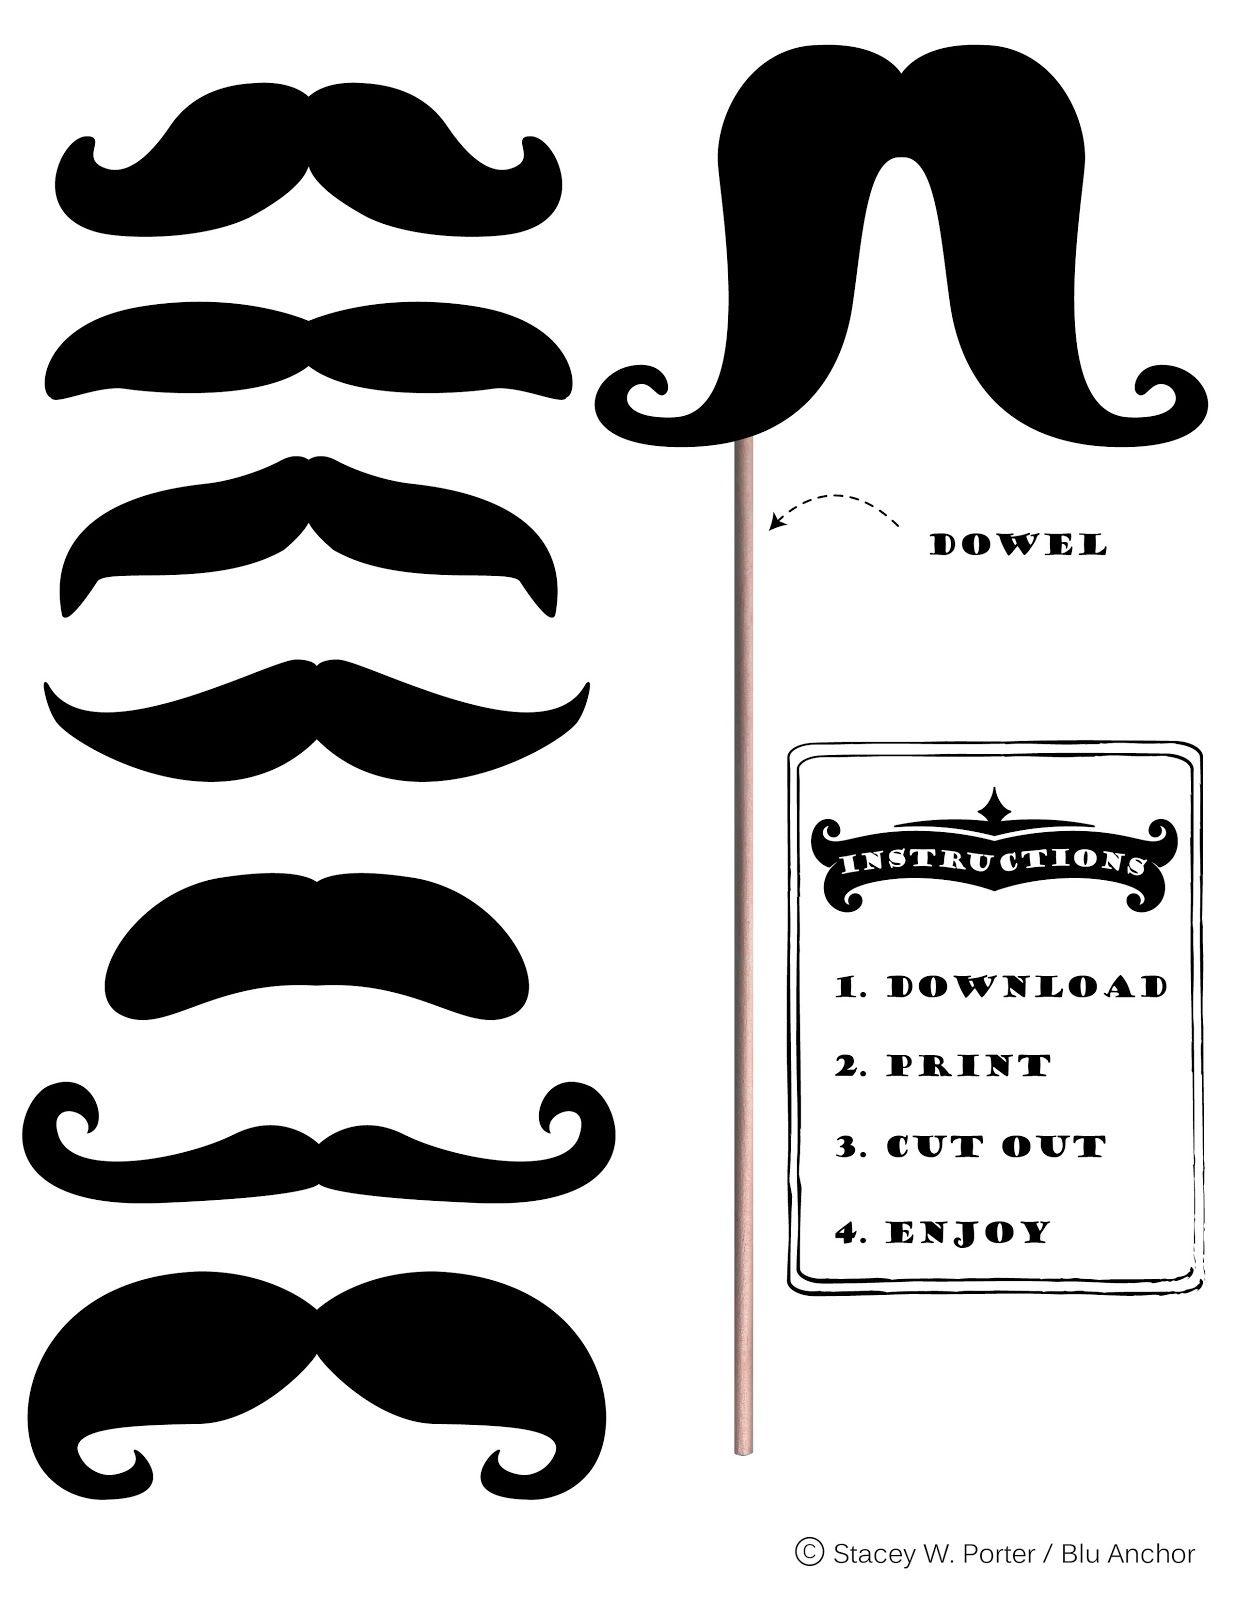 Free Printable Moustache Brigade For #movember | Stacey W. Porter - Free Printable Mustache